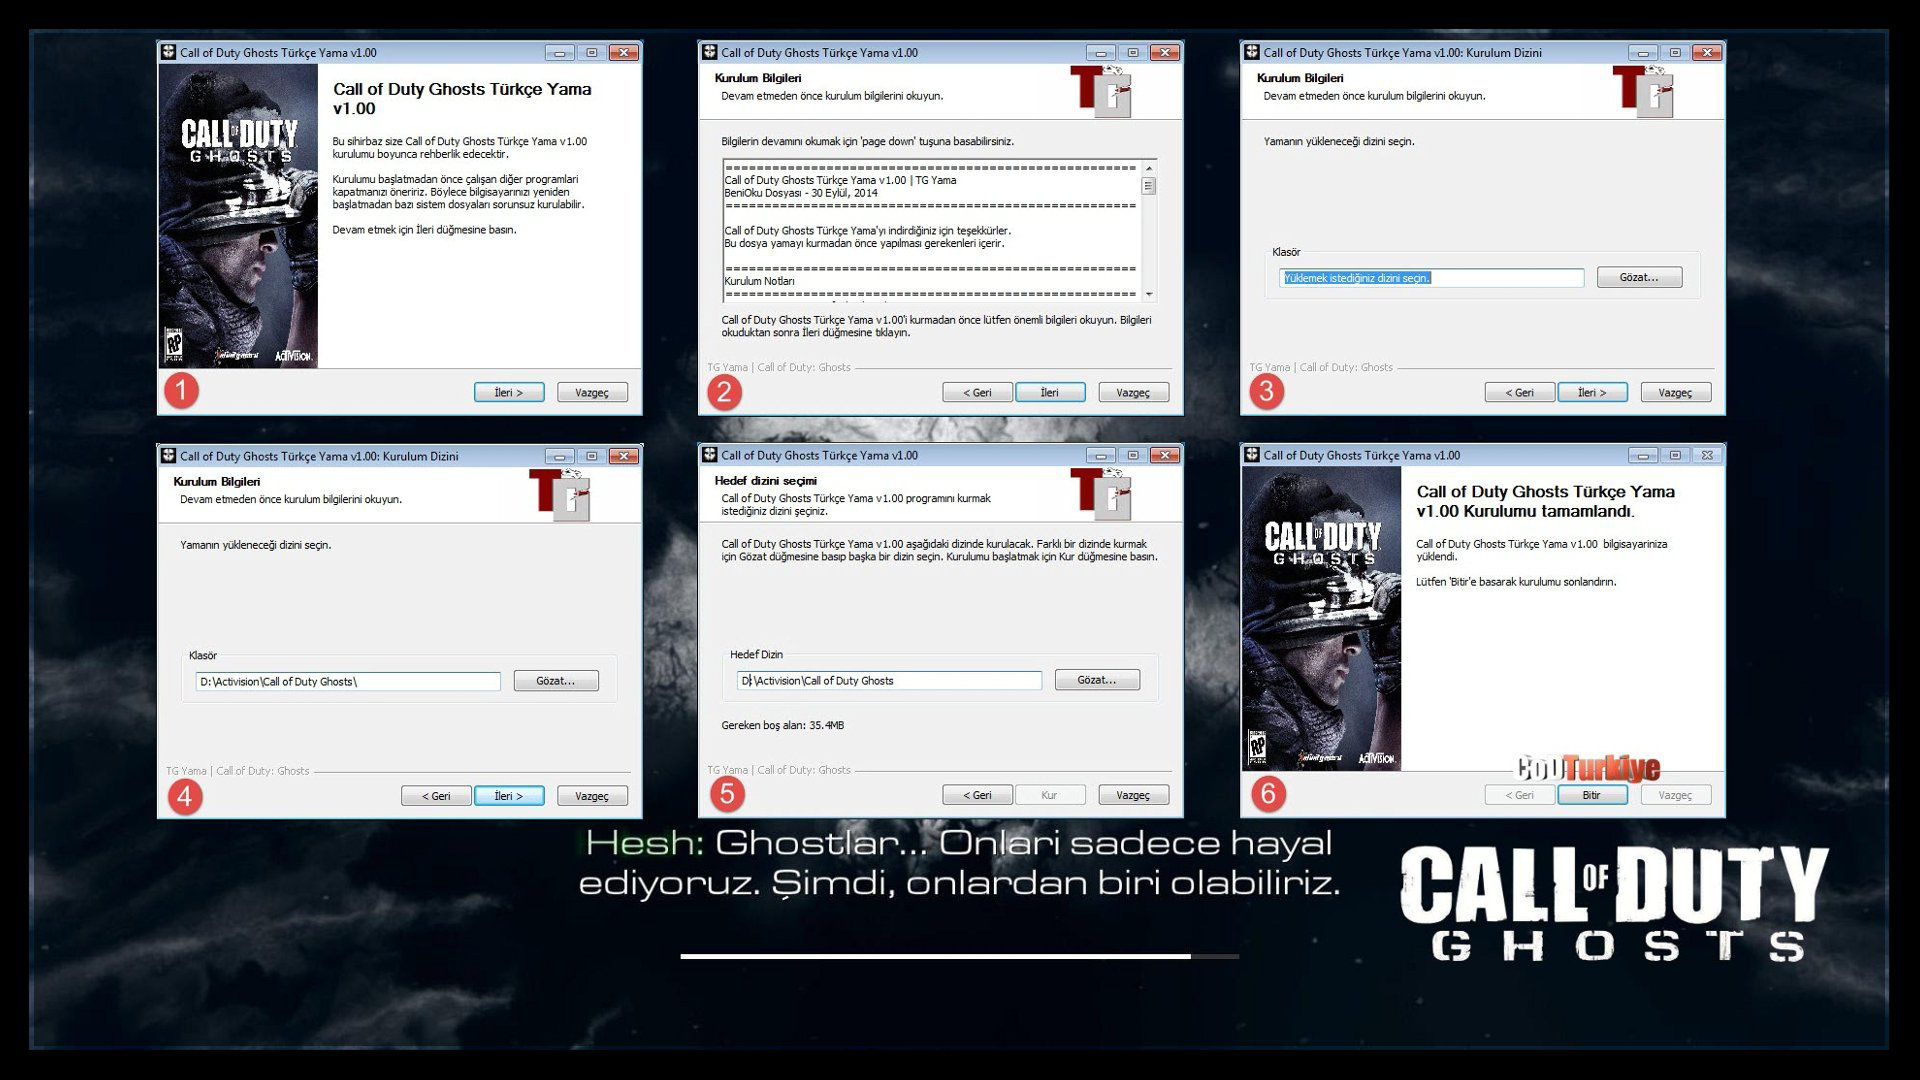 Call of Duty Ghosts Türkçe Yama Kurulum